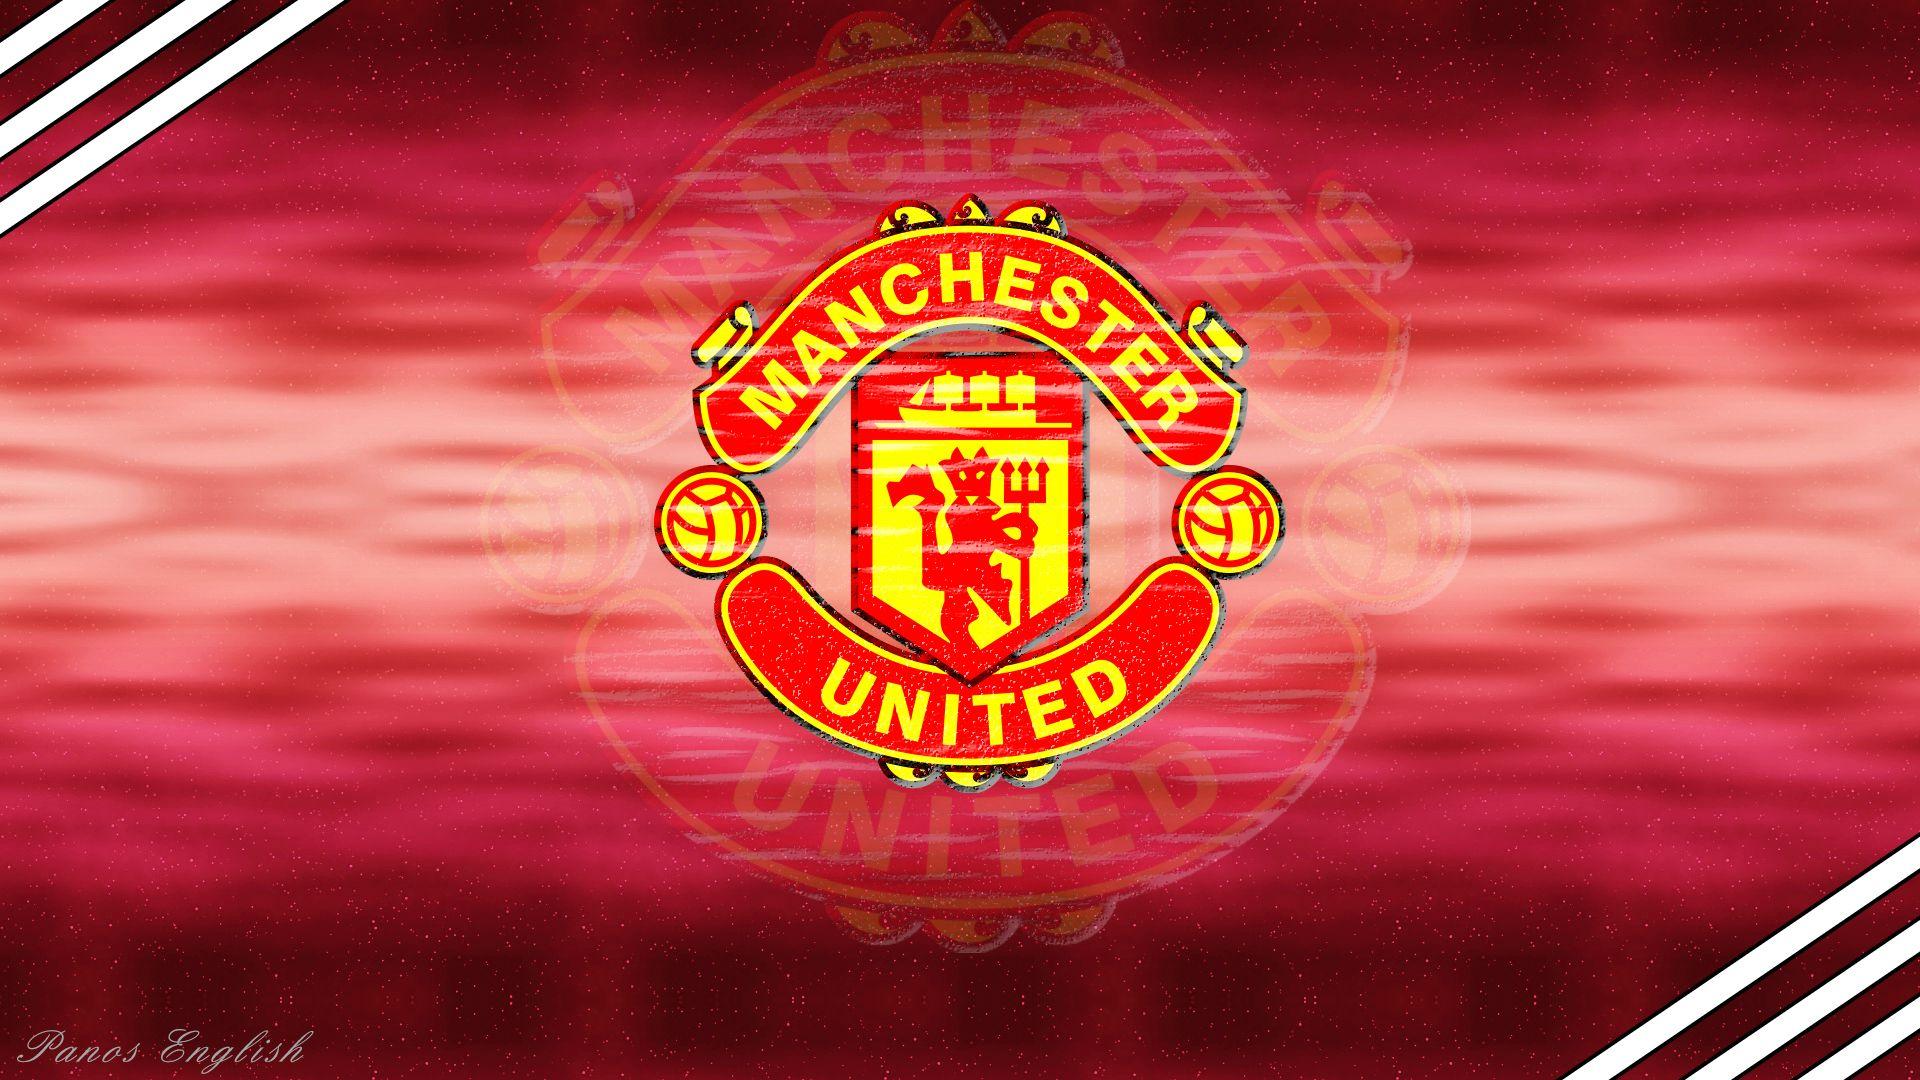 Manchester United Logo id 109271 BUZZERG 1920x1080